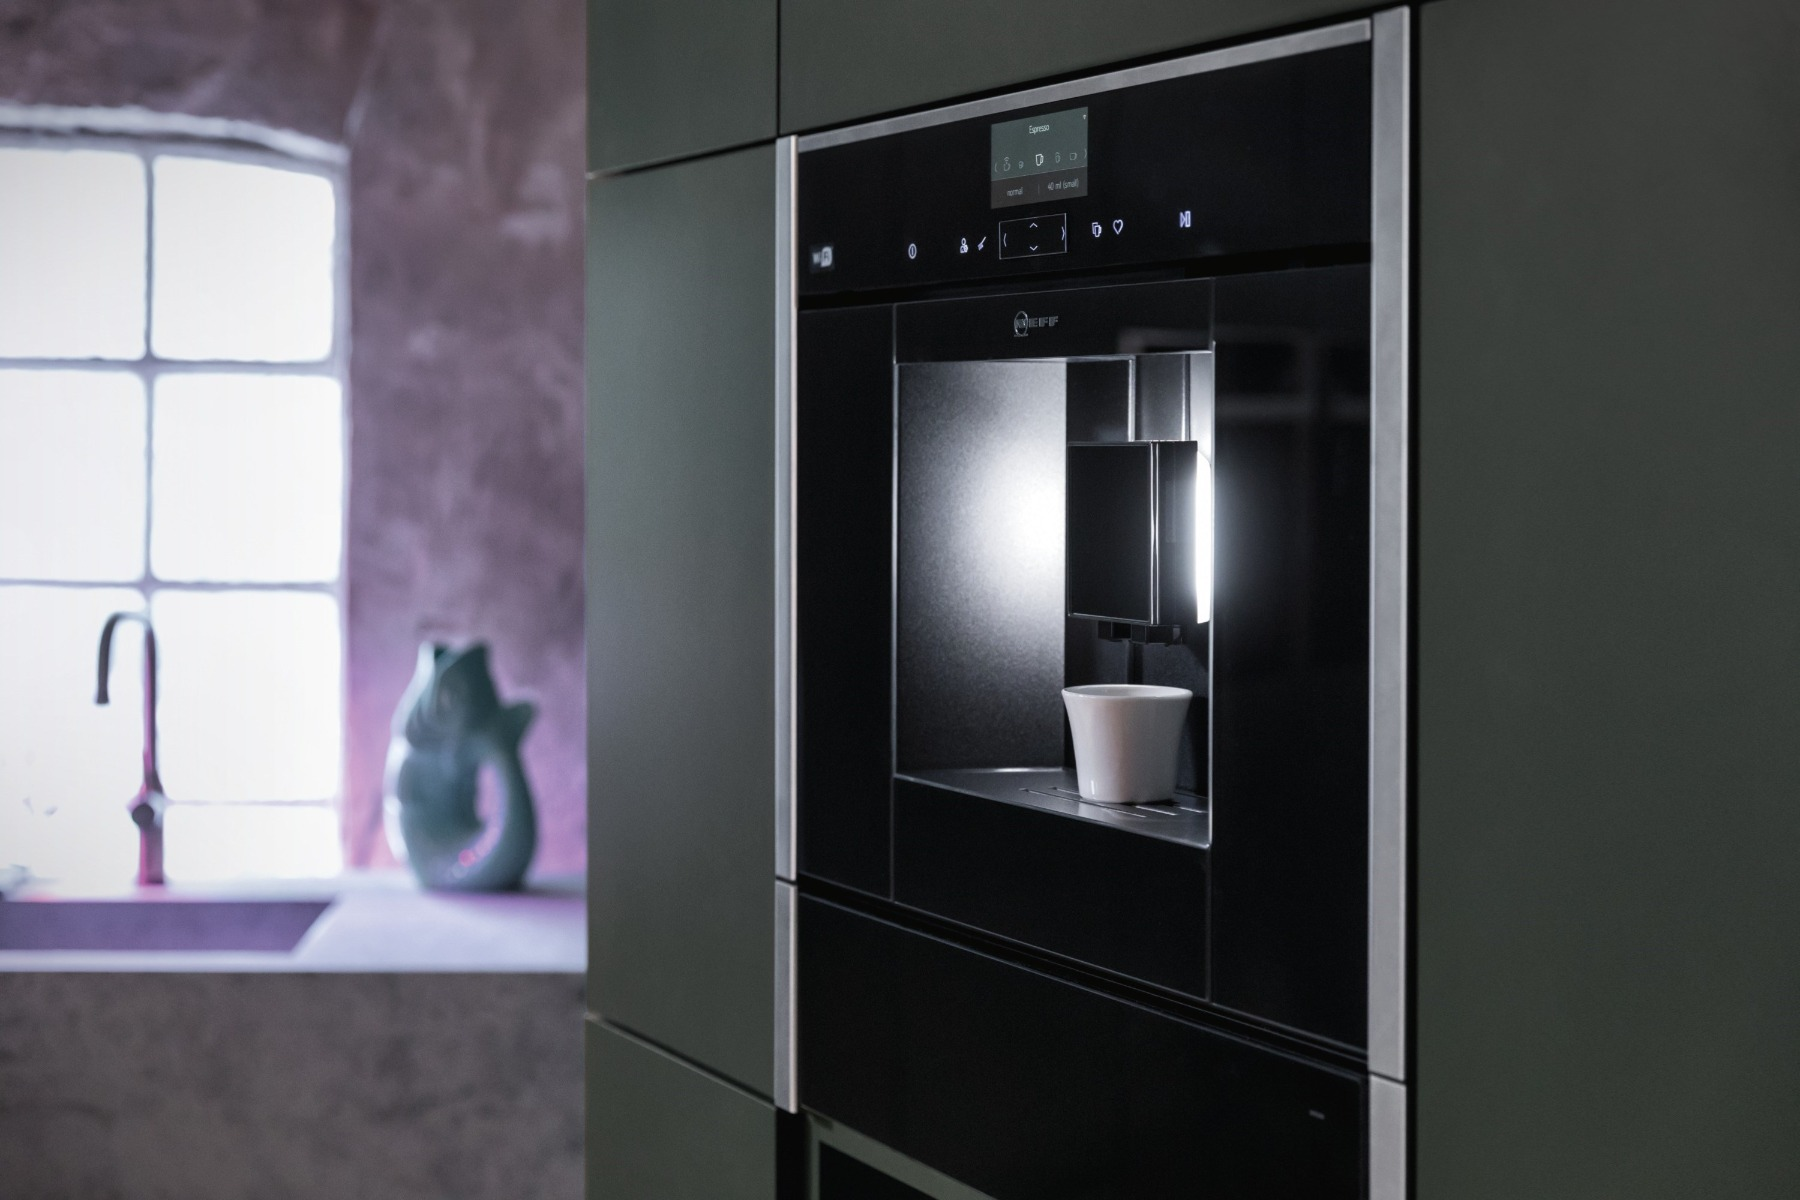 Appliances_Neff_Coffee_Machine